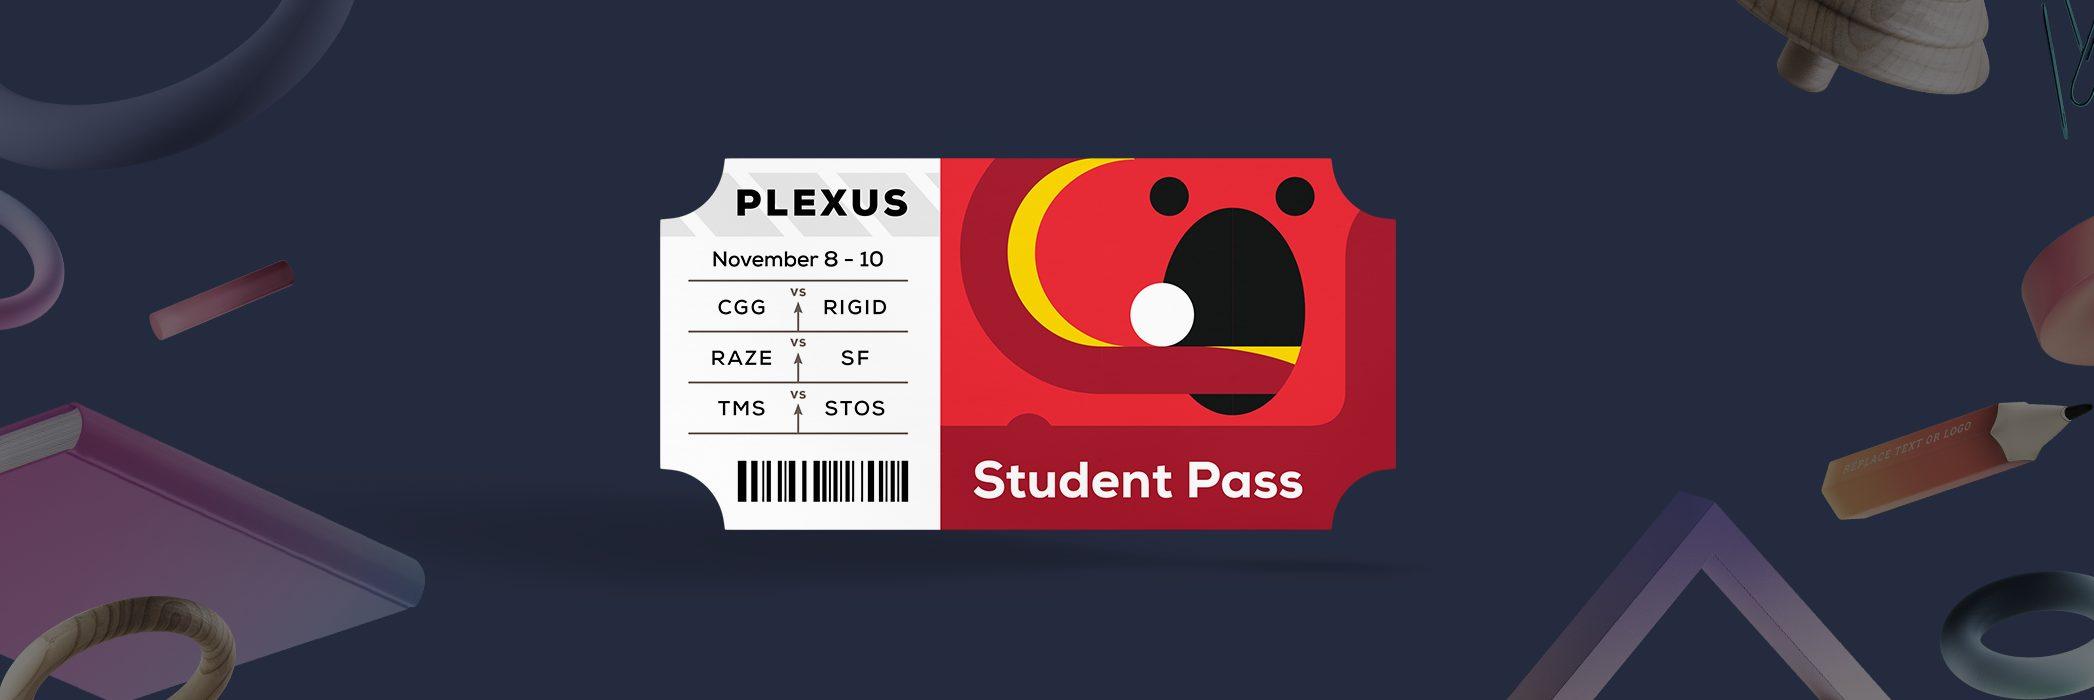 plexus ticker design